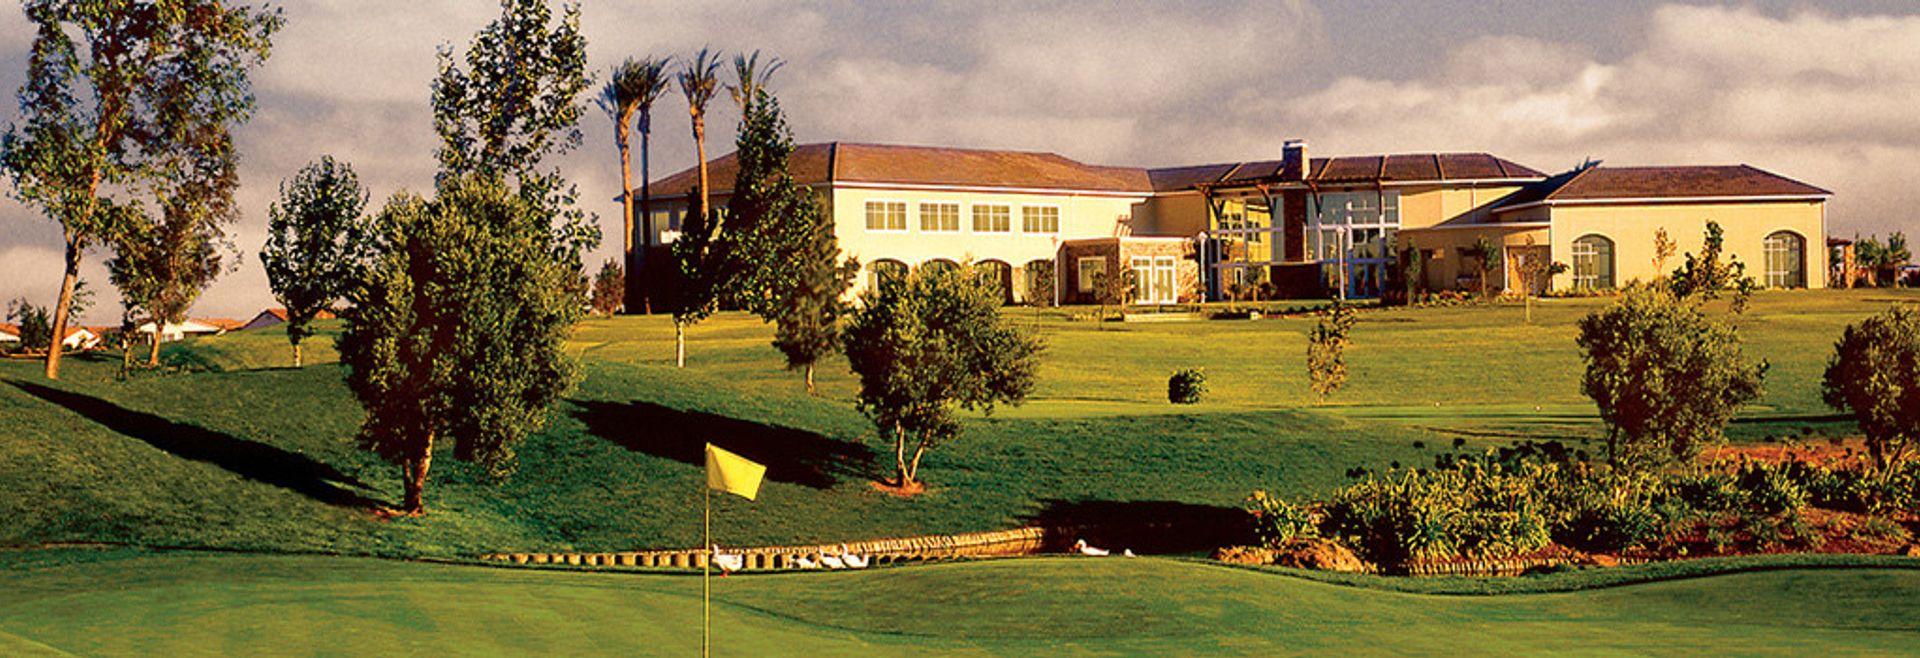 The Vista & Delta Clubs at Trilogy Rio Vista